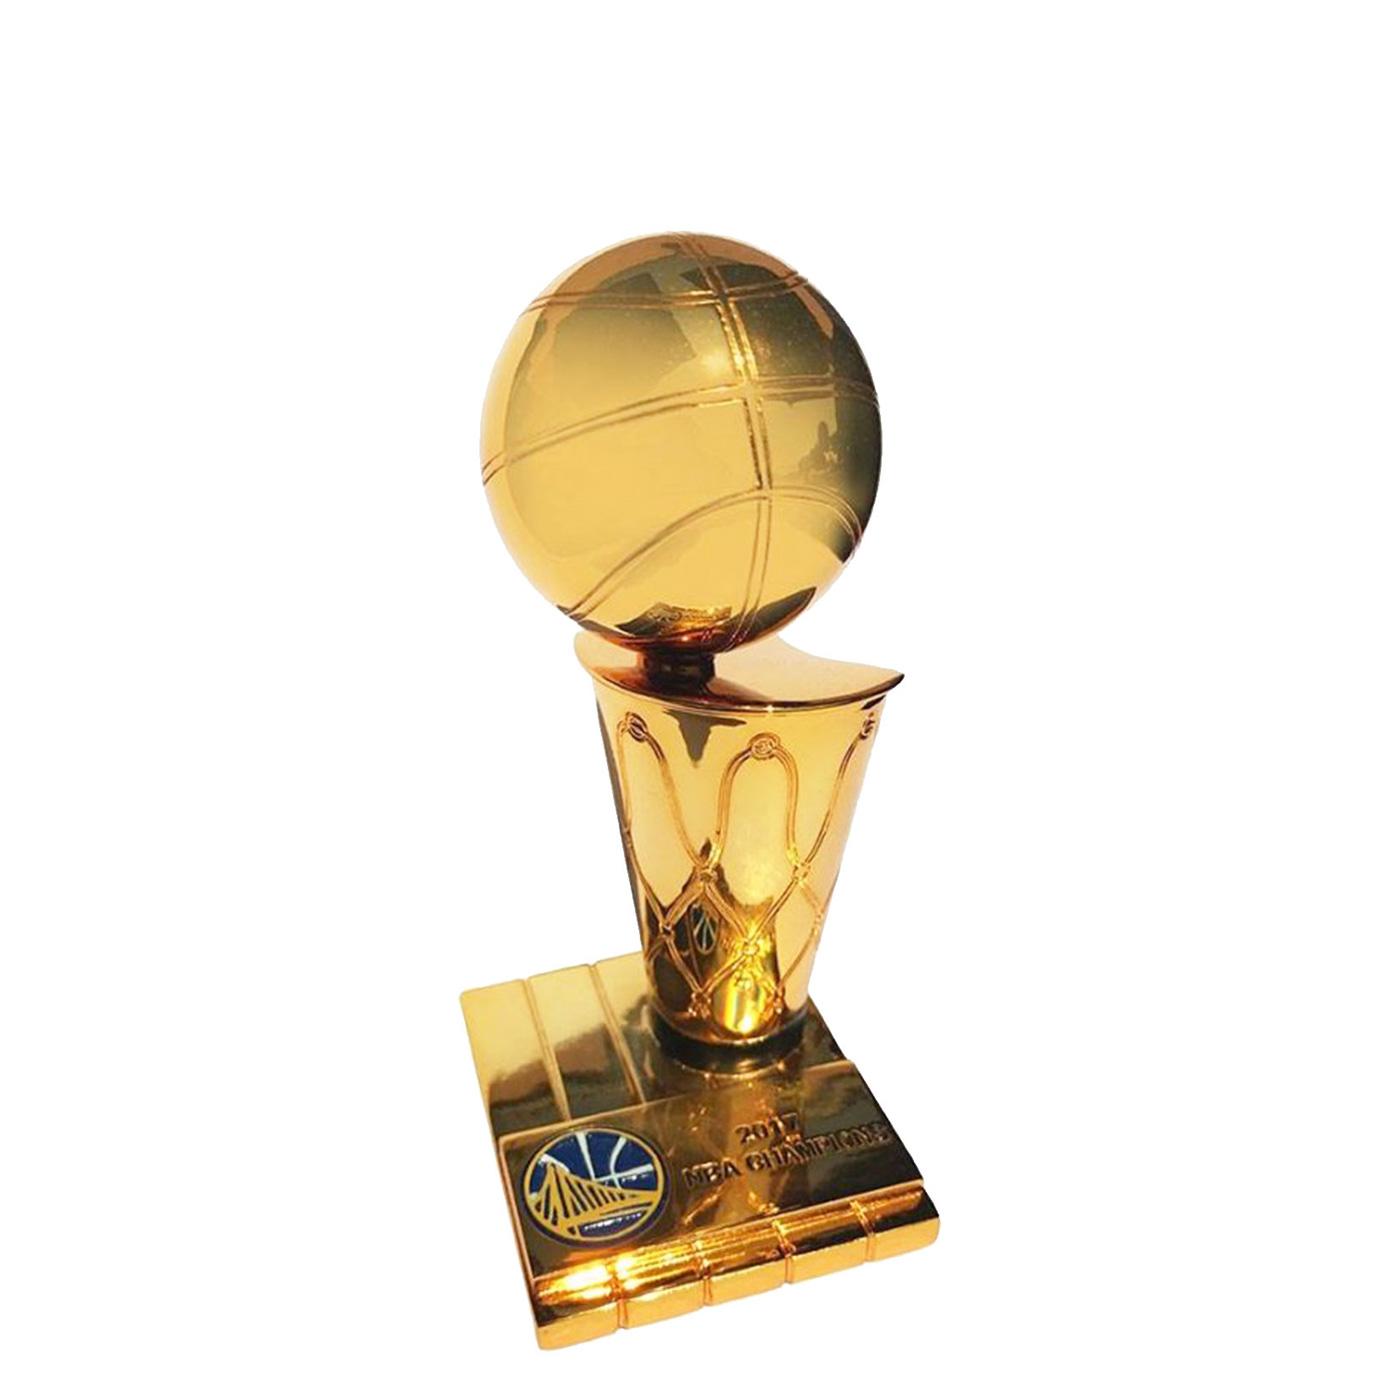 Nba Championship Trophy Png (+).